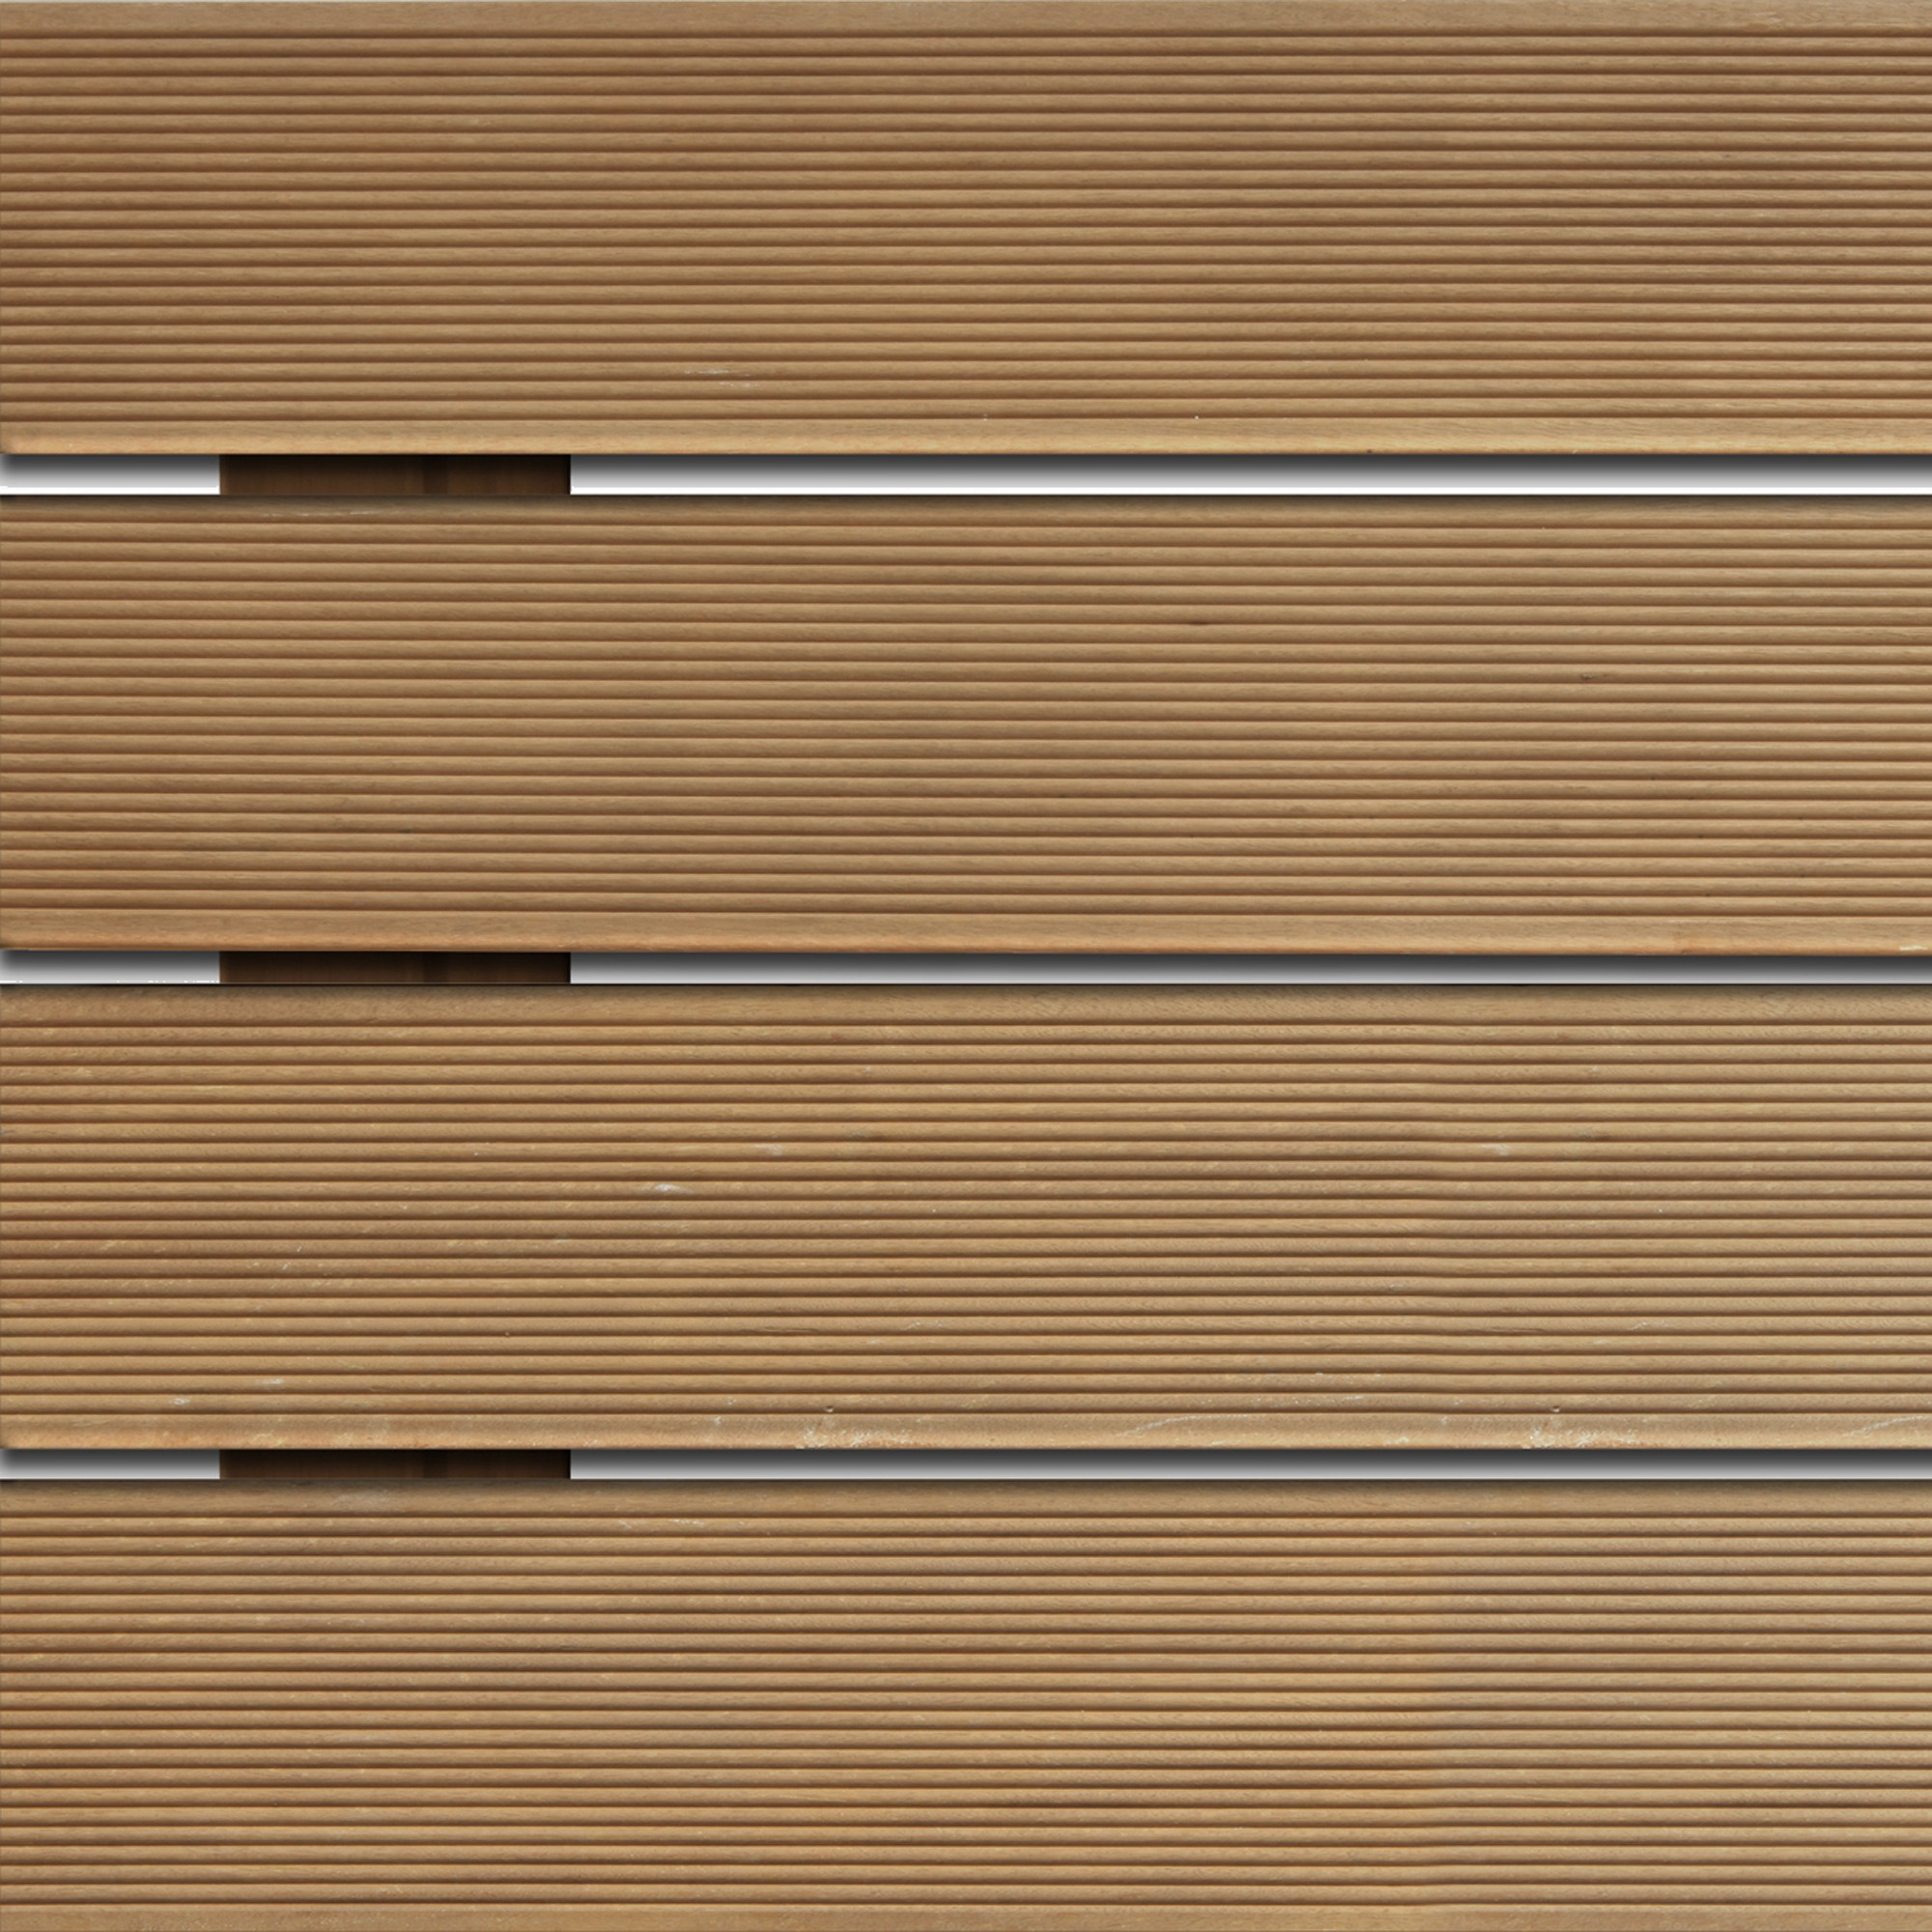 texture terrasse bois